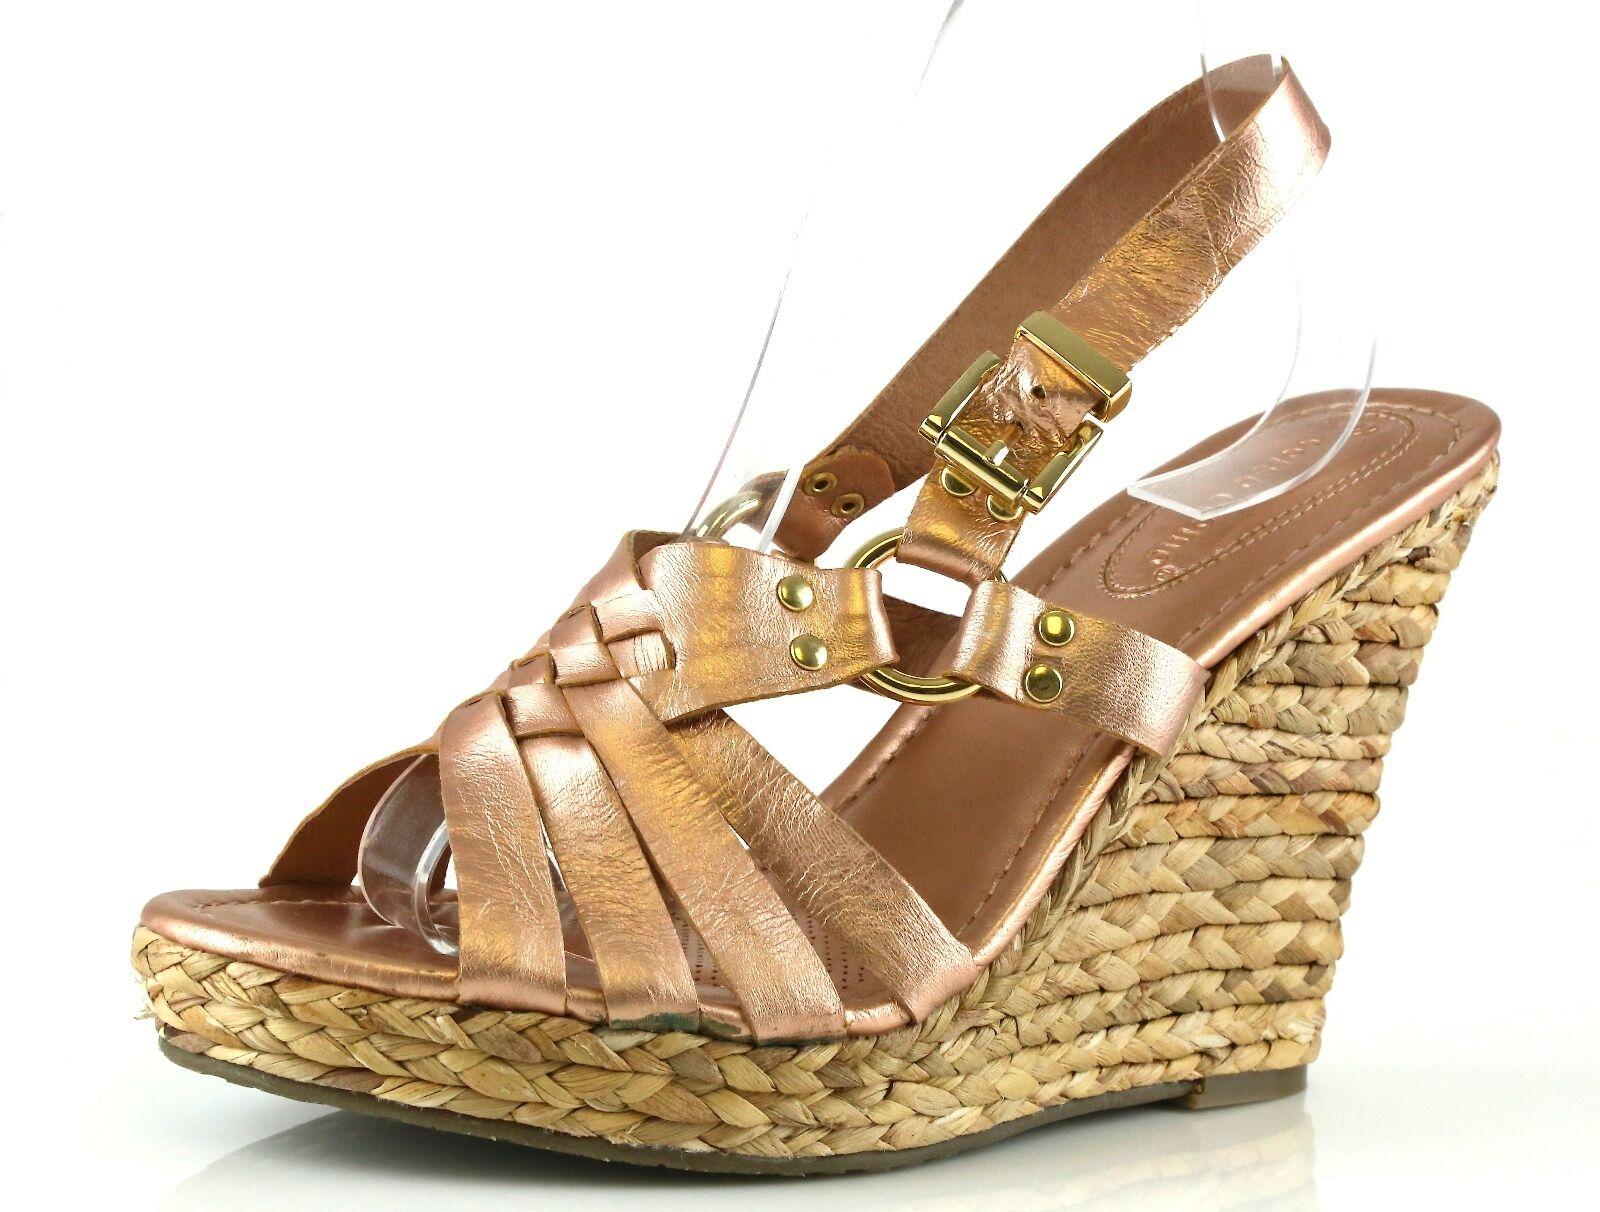 Corso Como DIVER Metallic Ankle Strap Wedge Sandals 7020 Size 10 M NEW